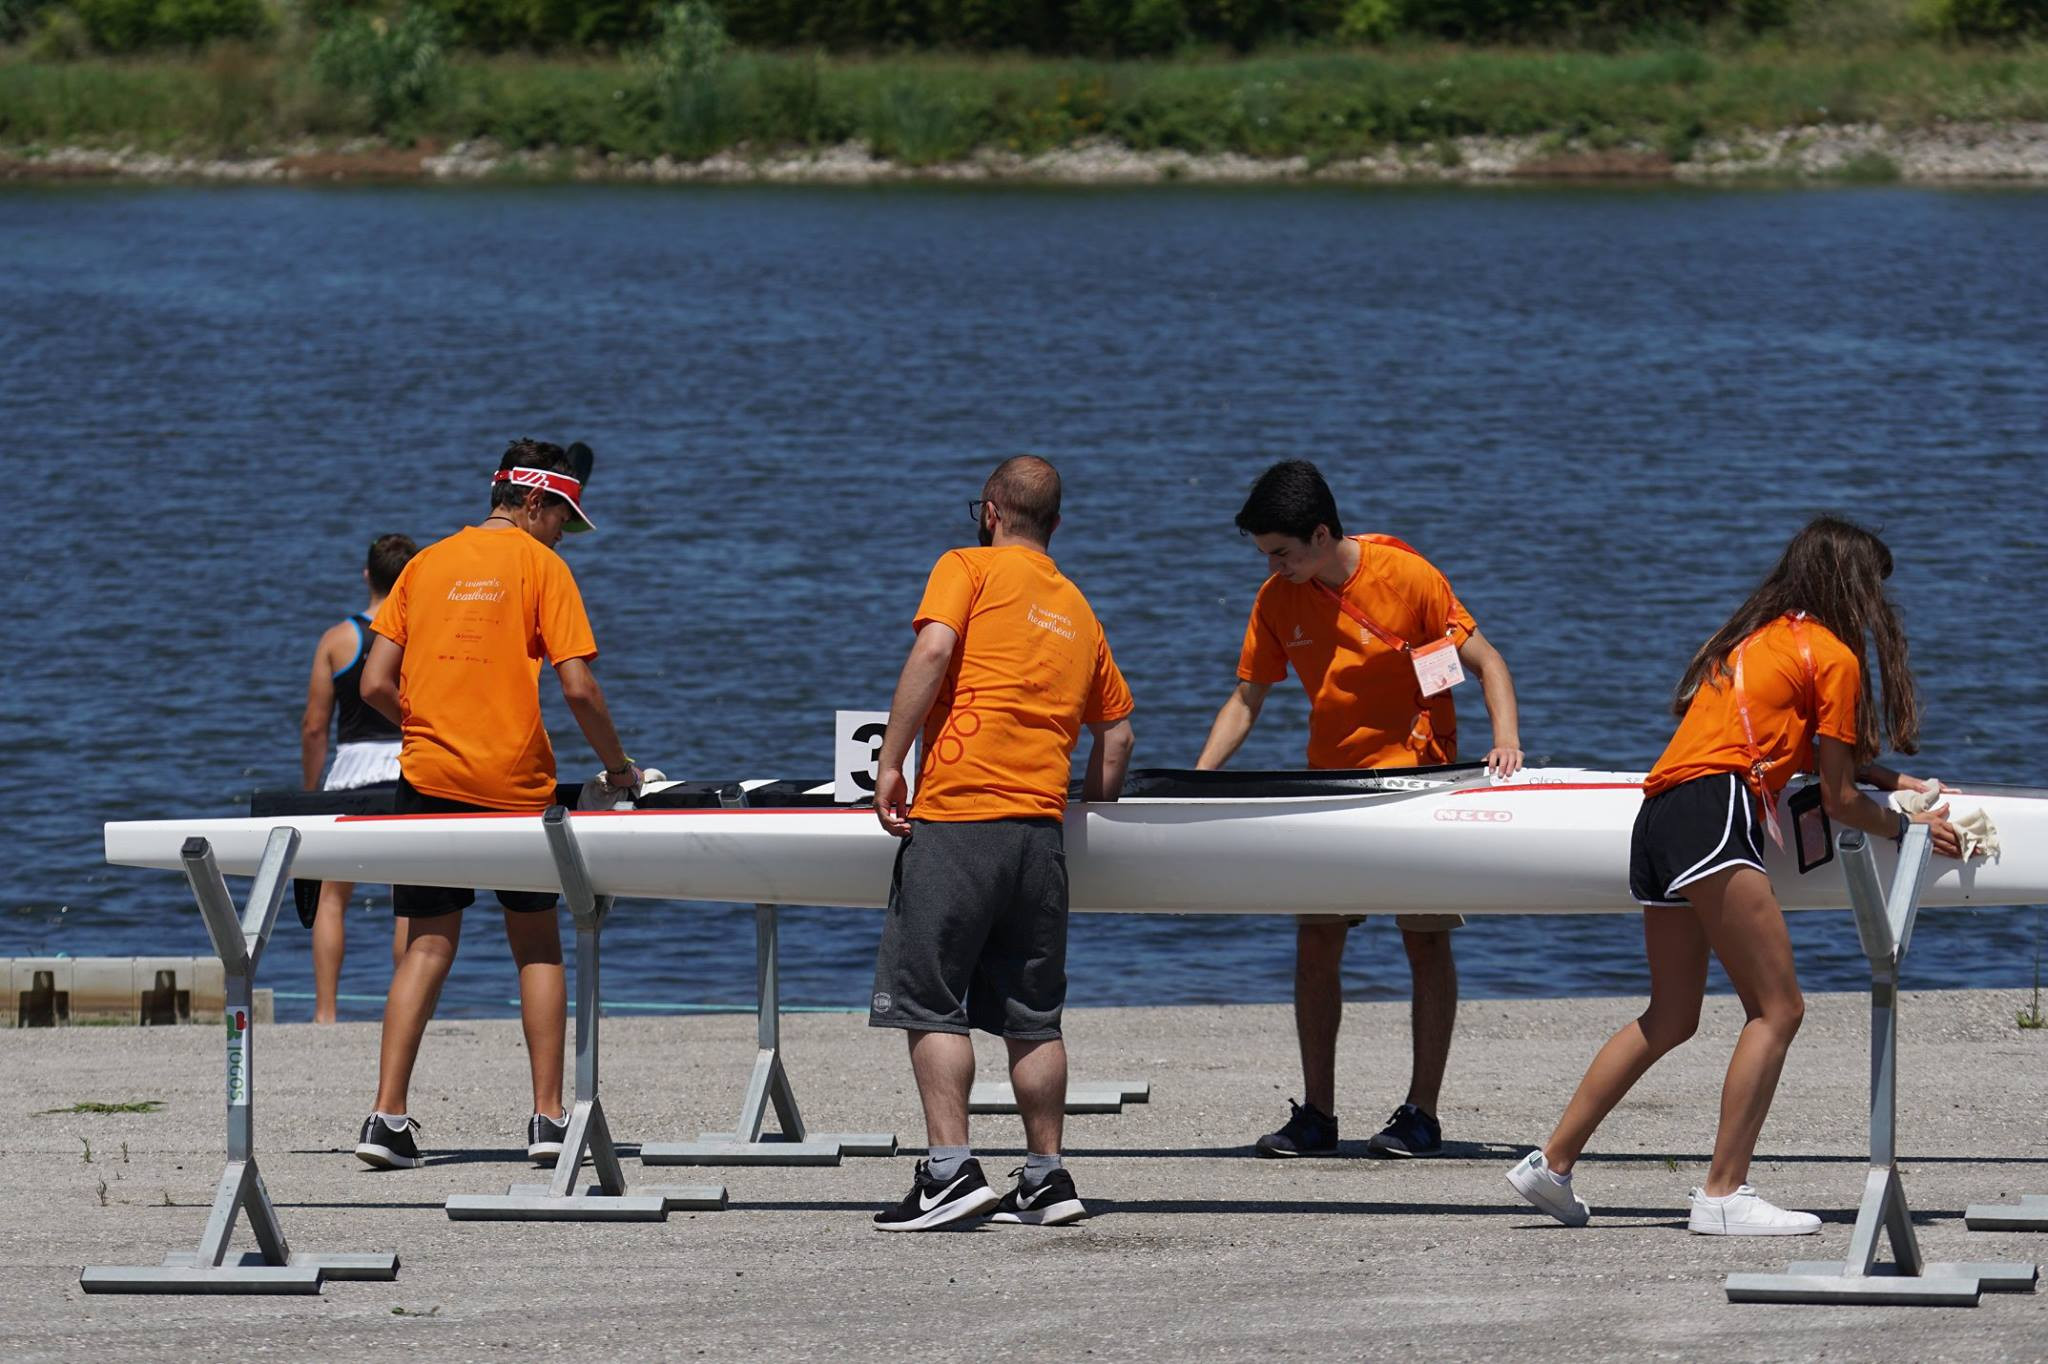 Hosts University of Coimbra enjoy European Universities Games canoe sprint success